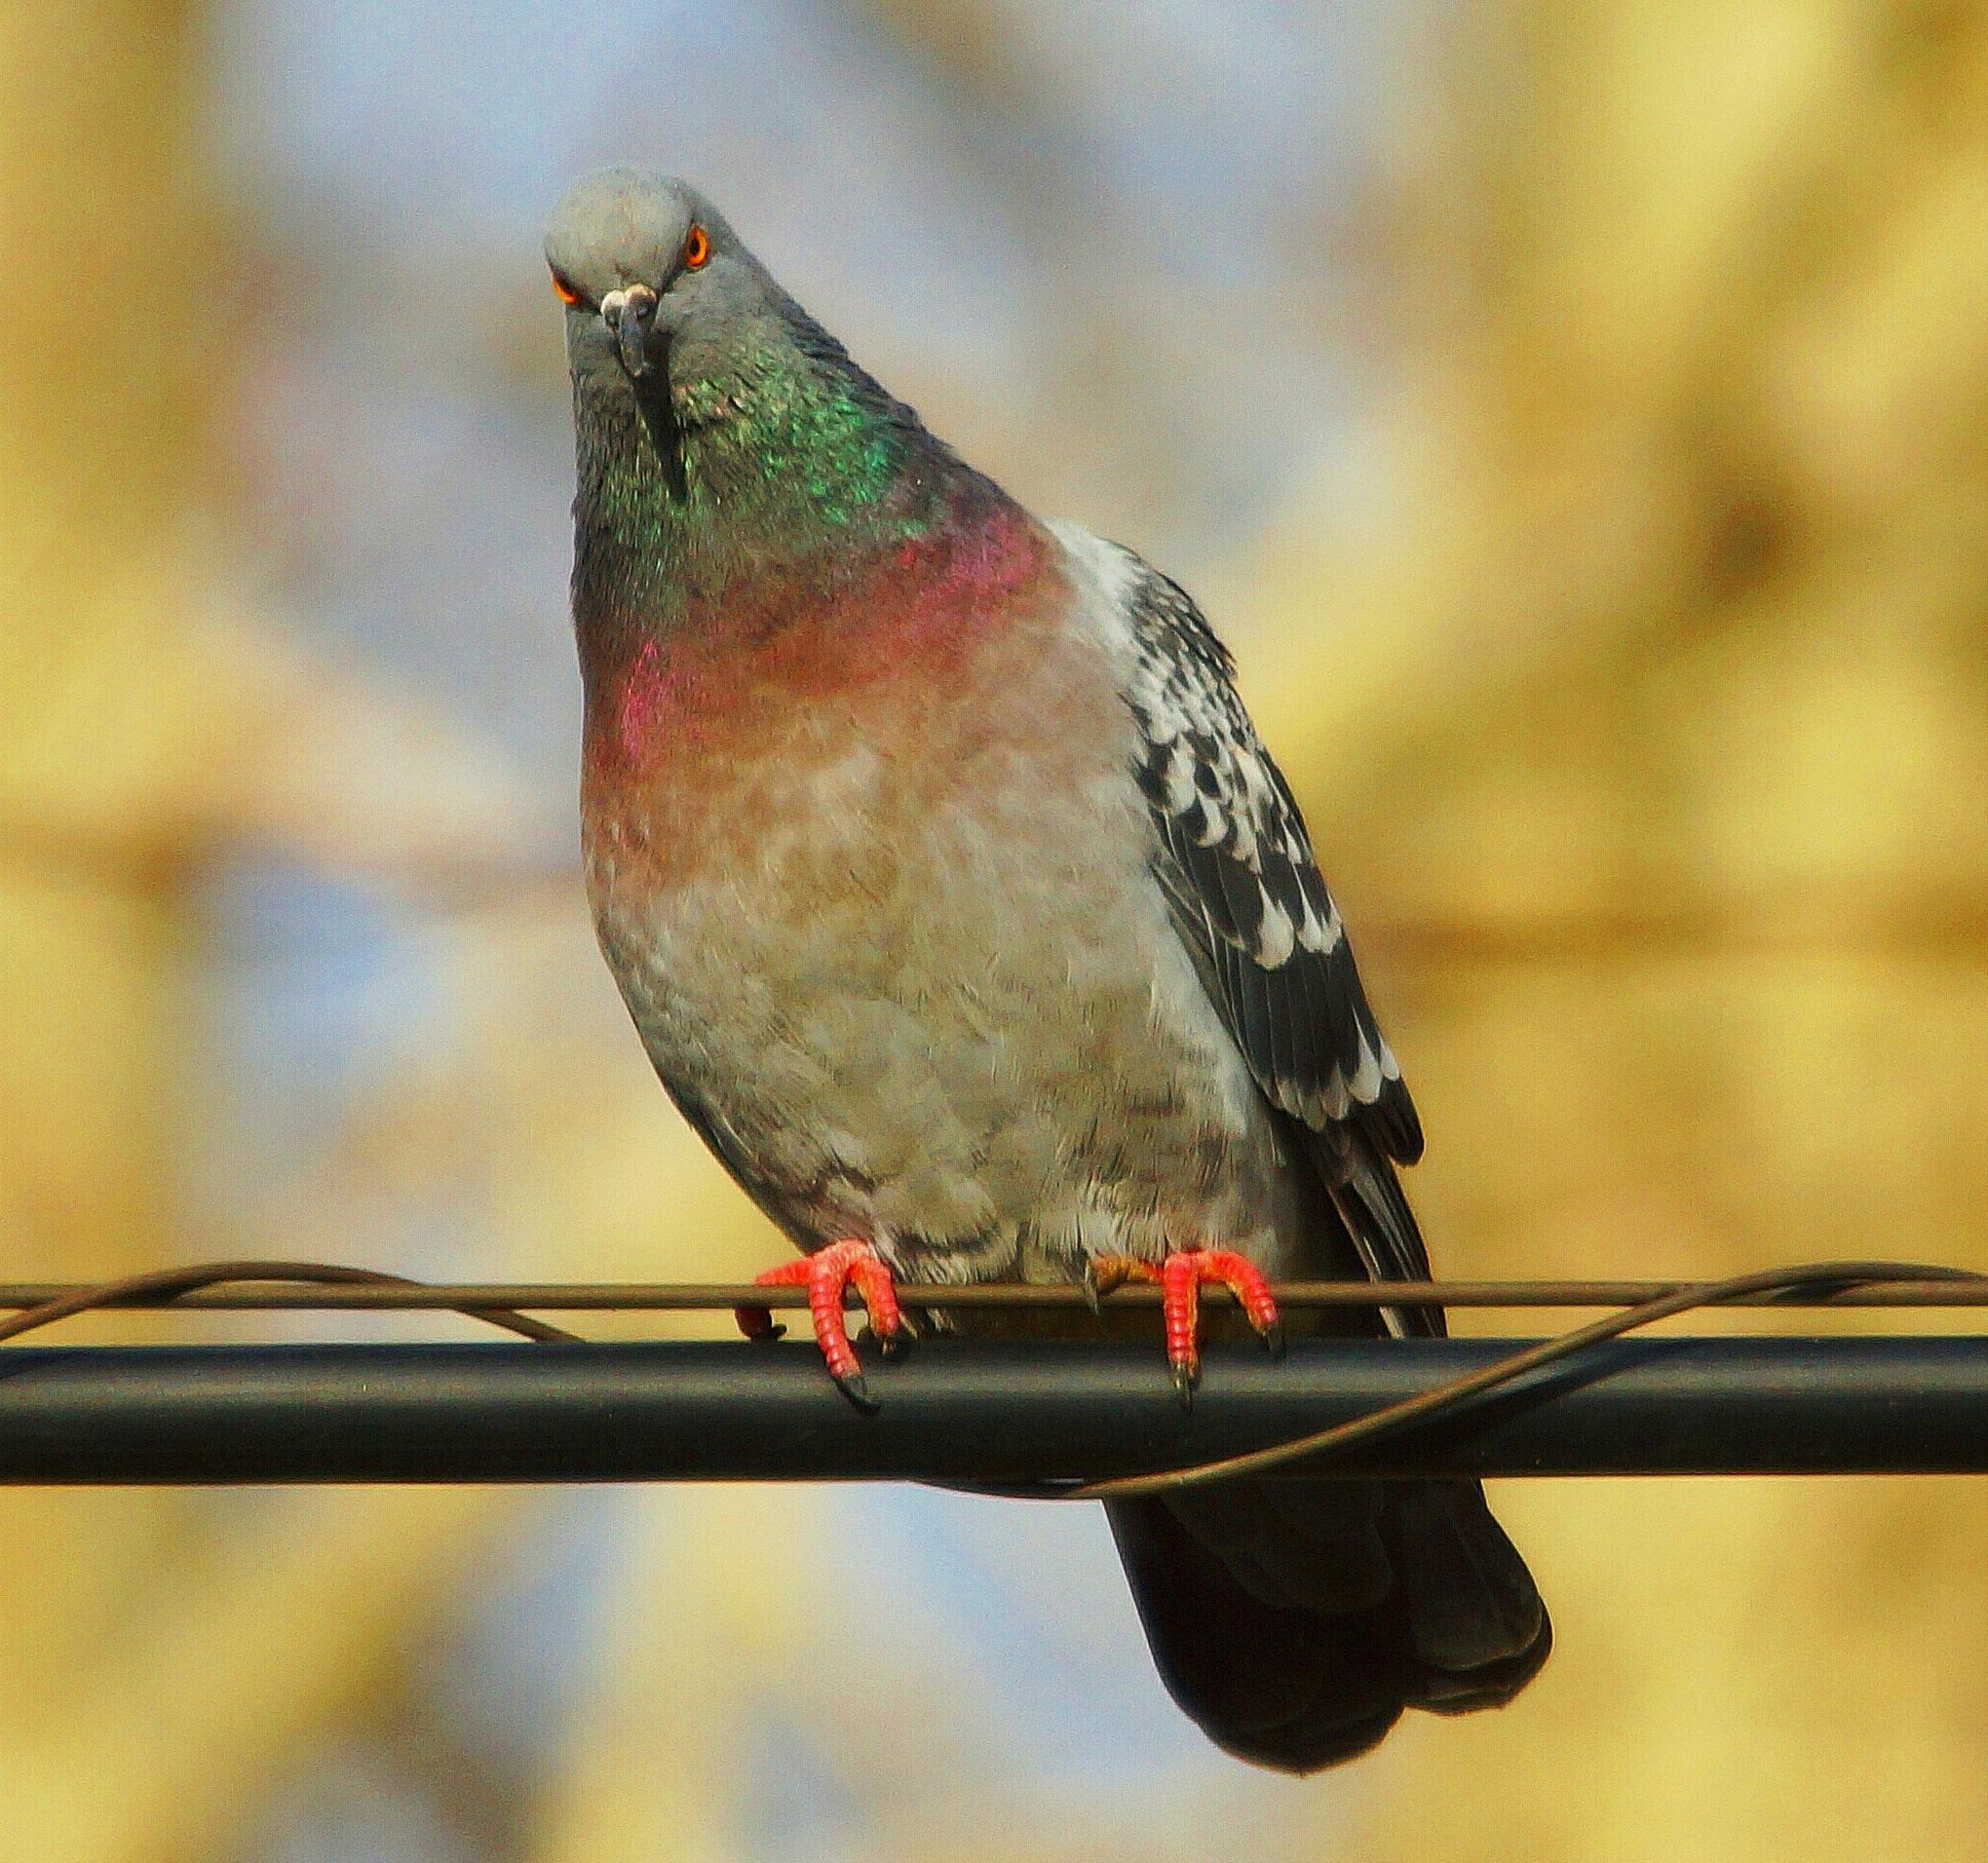 Blue rock pigeon by sergey.parfeniuk